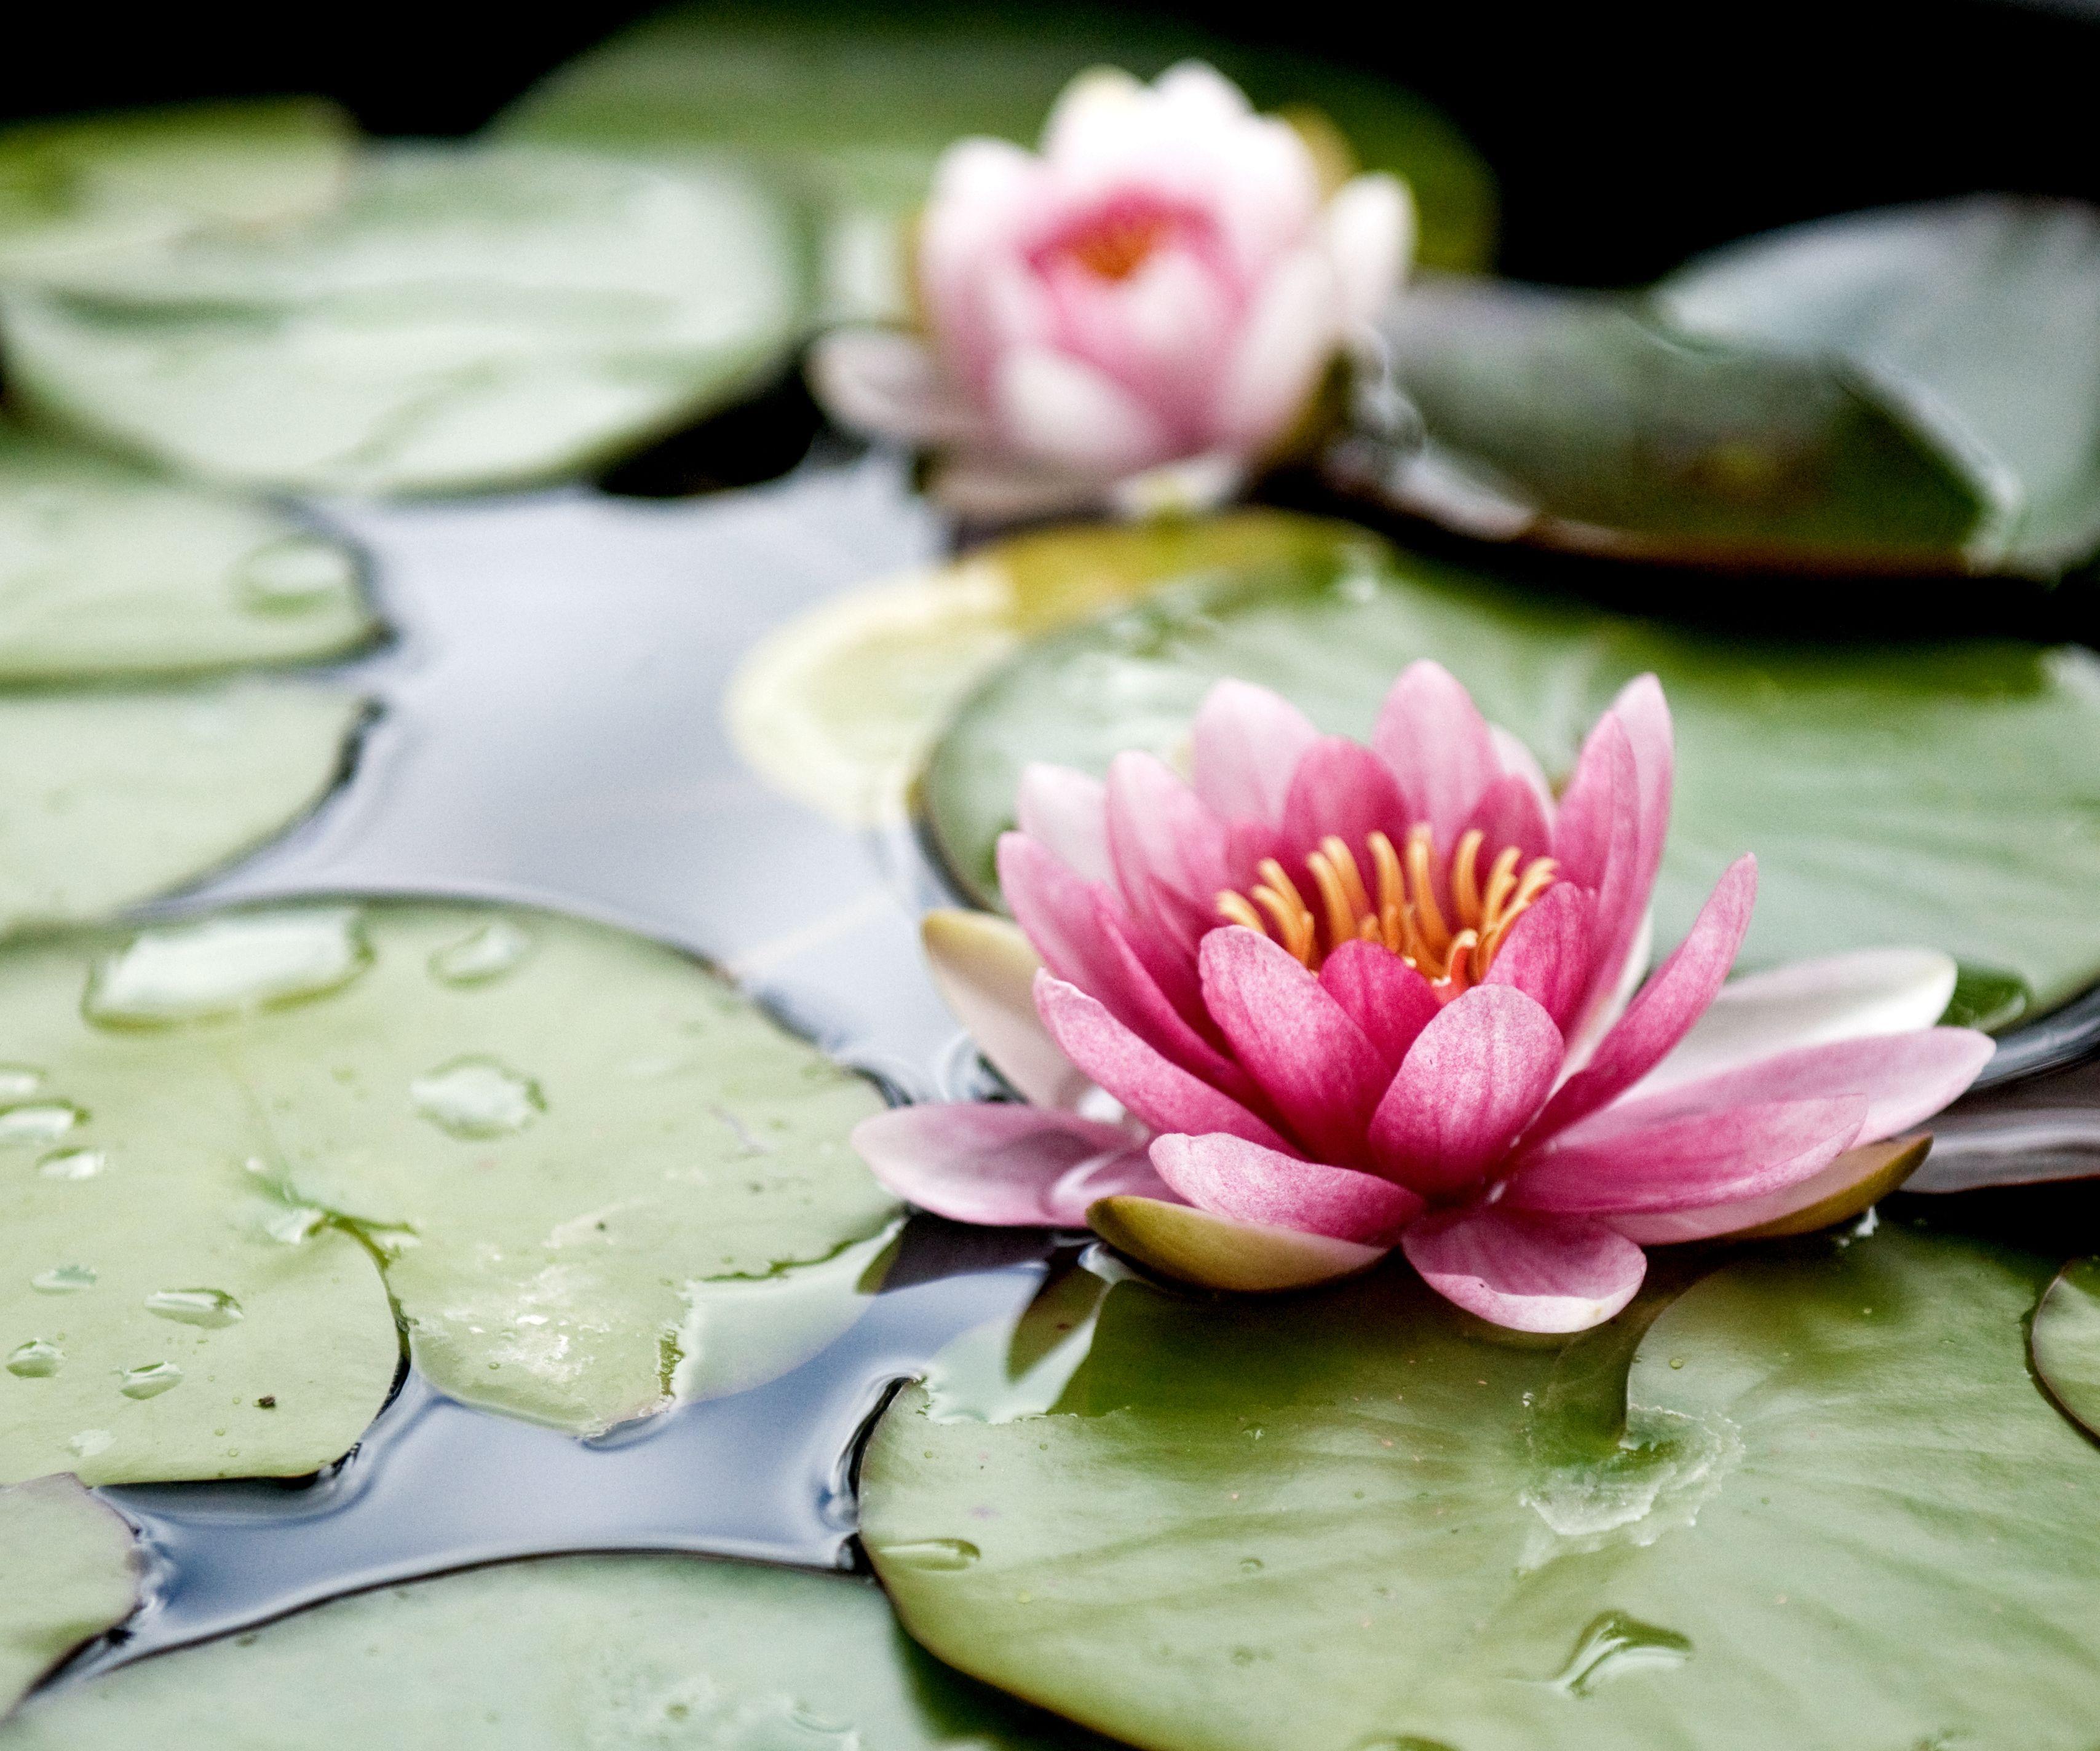 Homegoods spa flowers and gardens spa life izmirmasajfo Gallery